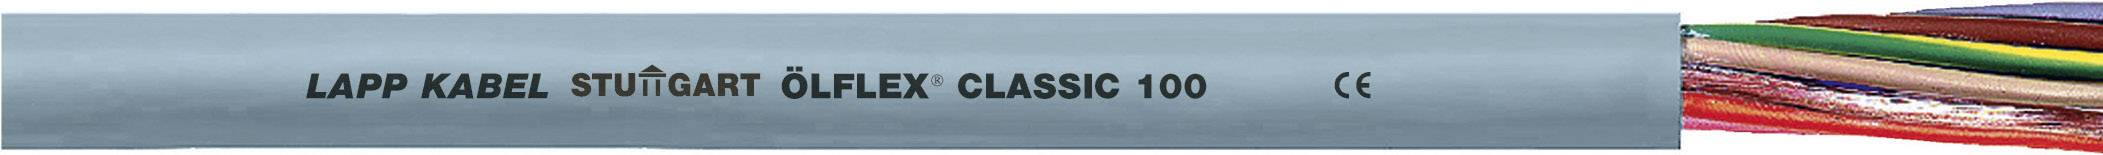 Kabel LappKabel Ölflex CLASSIC 100 24G0,5 (0010012), PVC, 12,4 mm, 500 V, šedá, 500 m